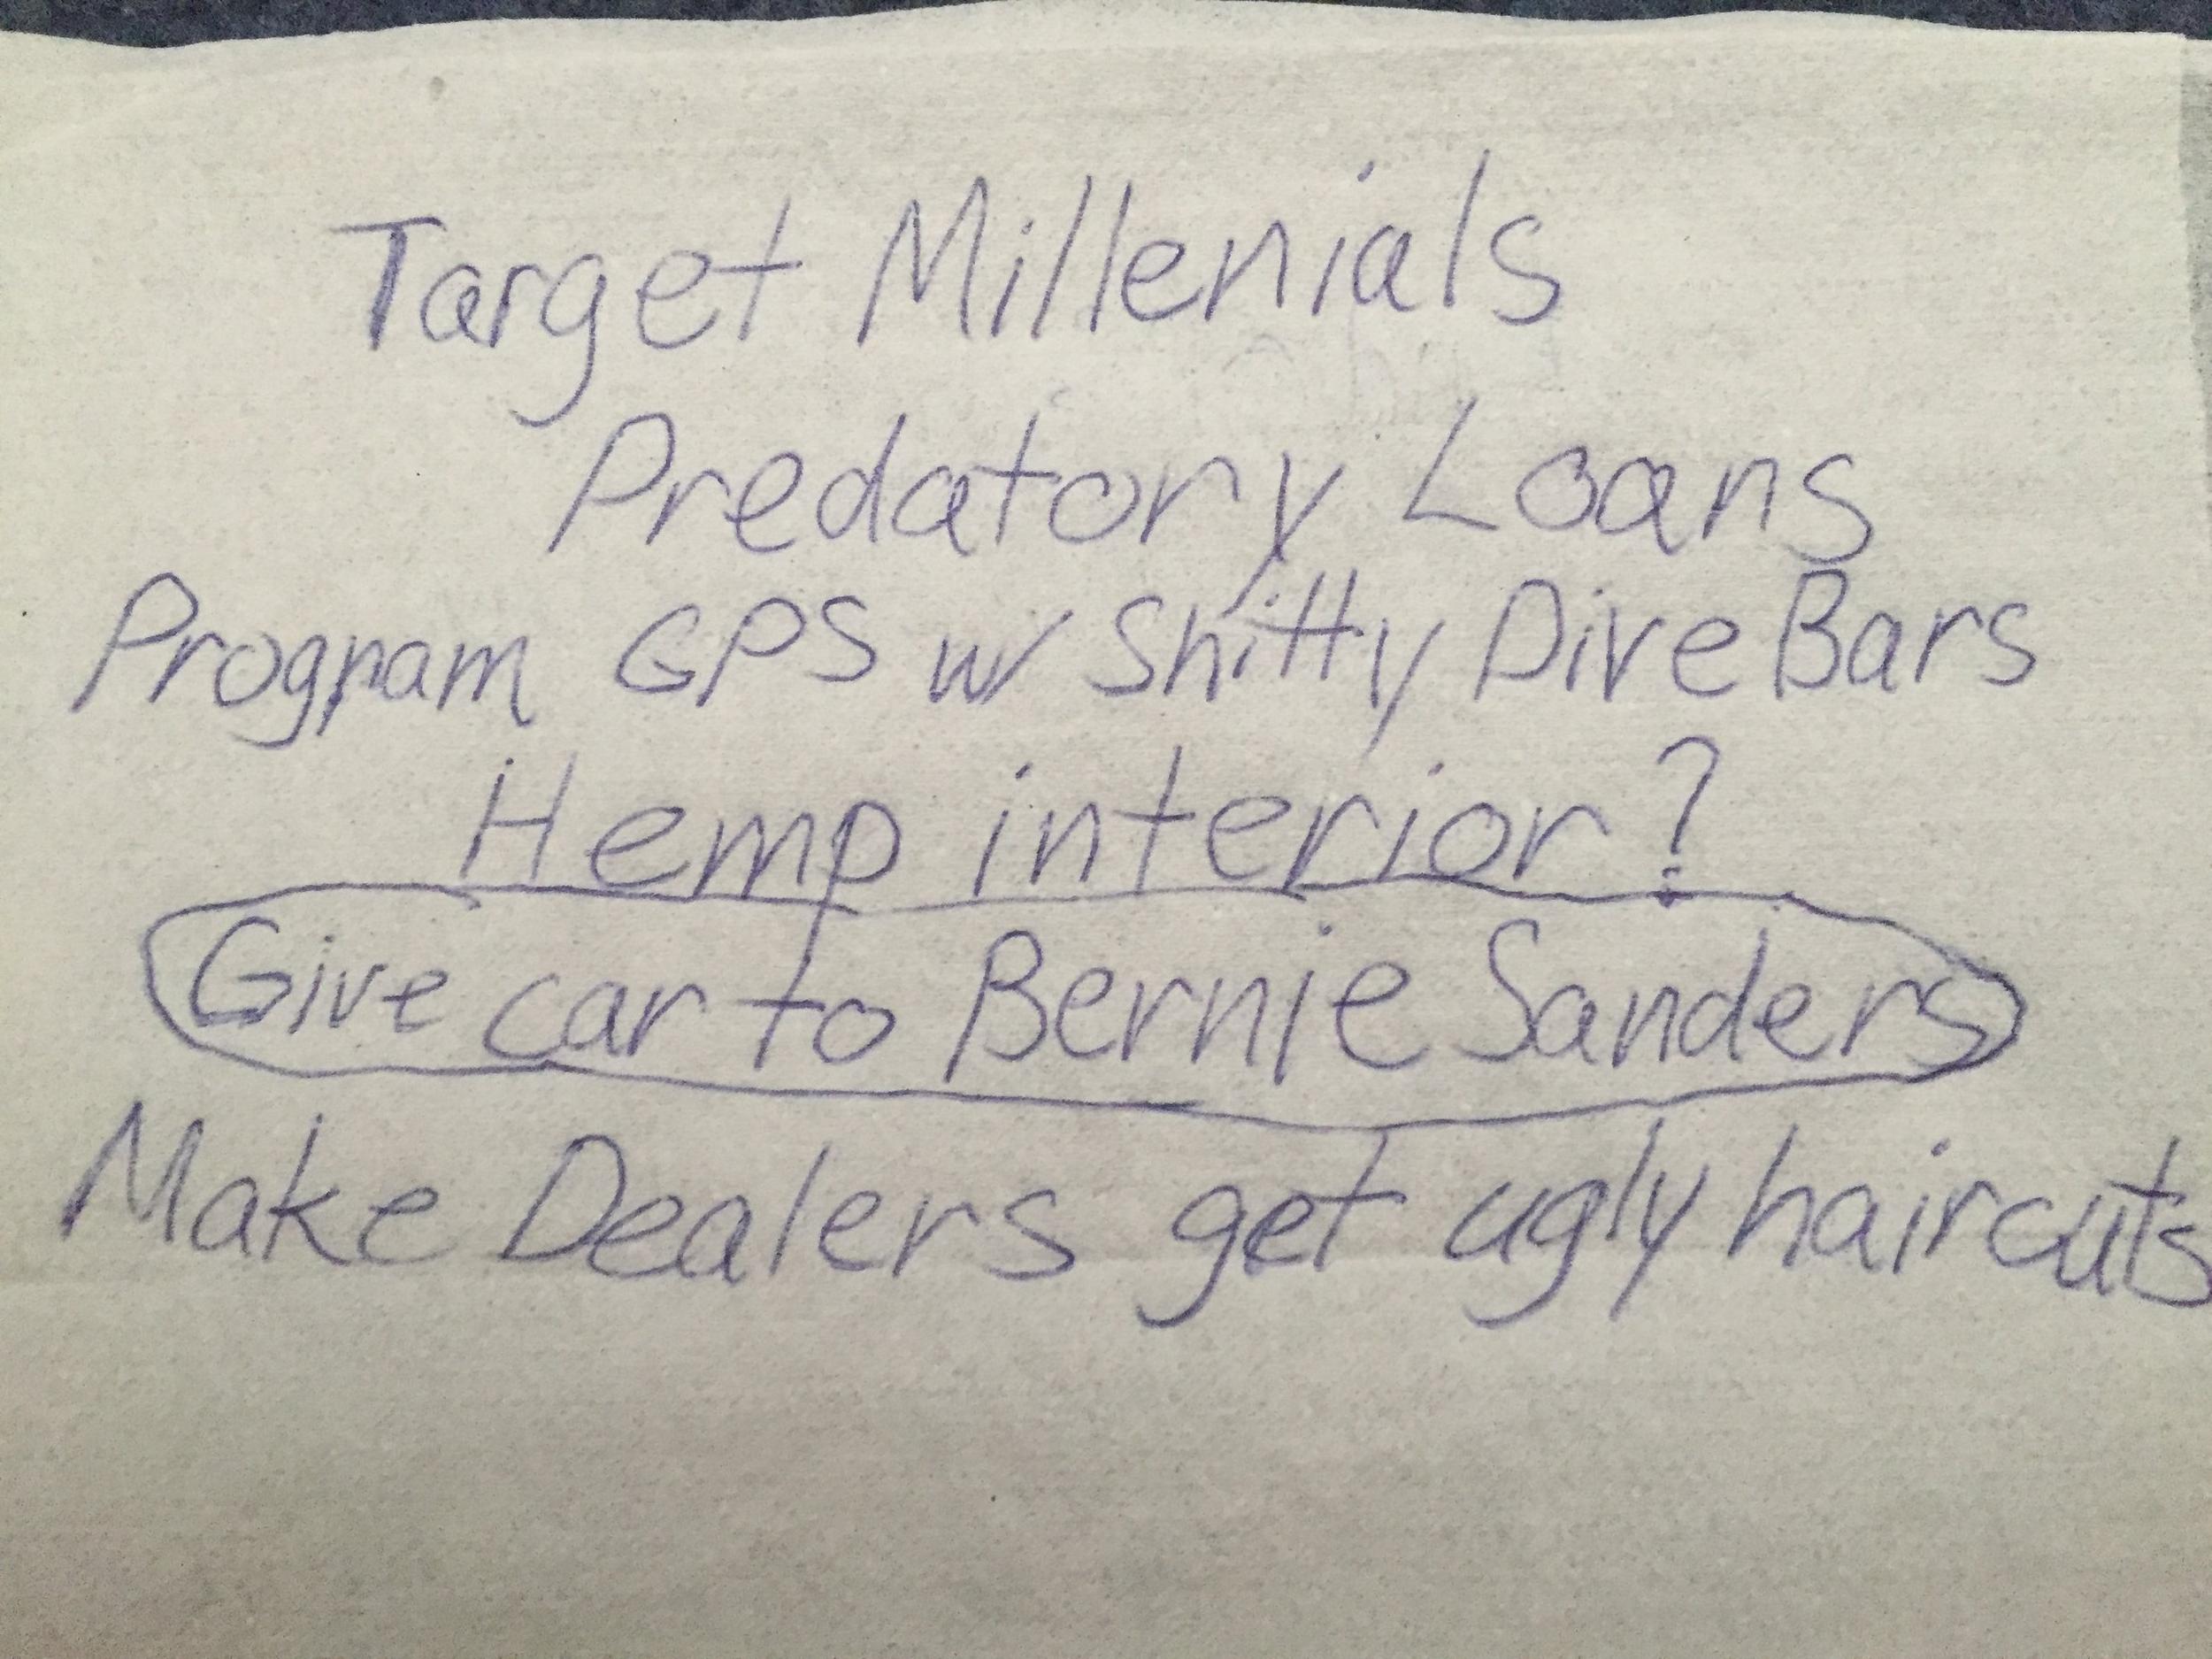 Bernie Sanders has huge sway over millennial mindshare, as he is basically their God.